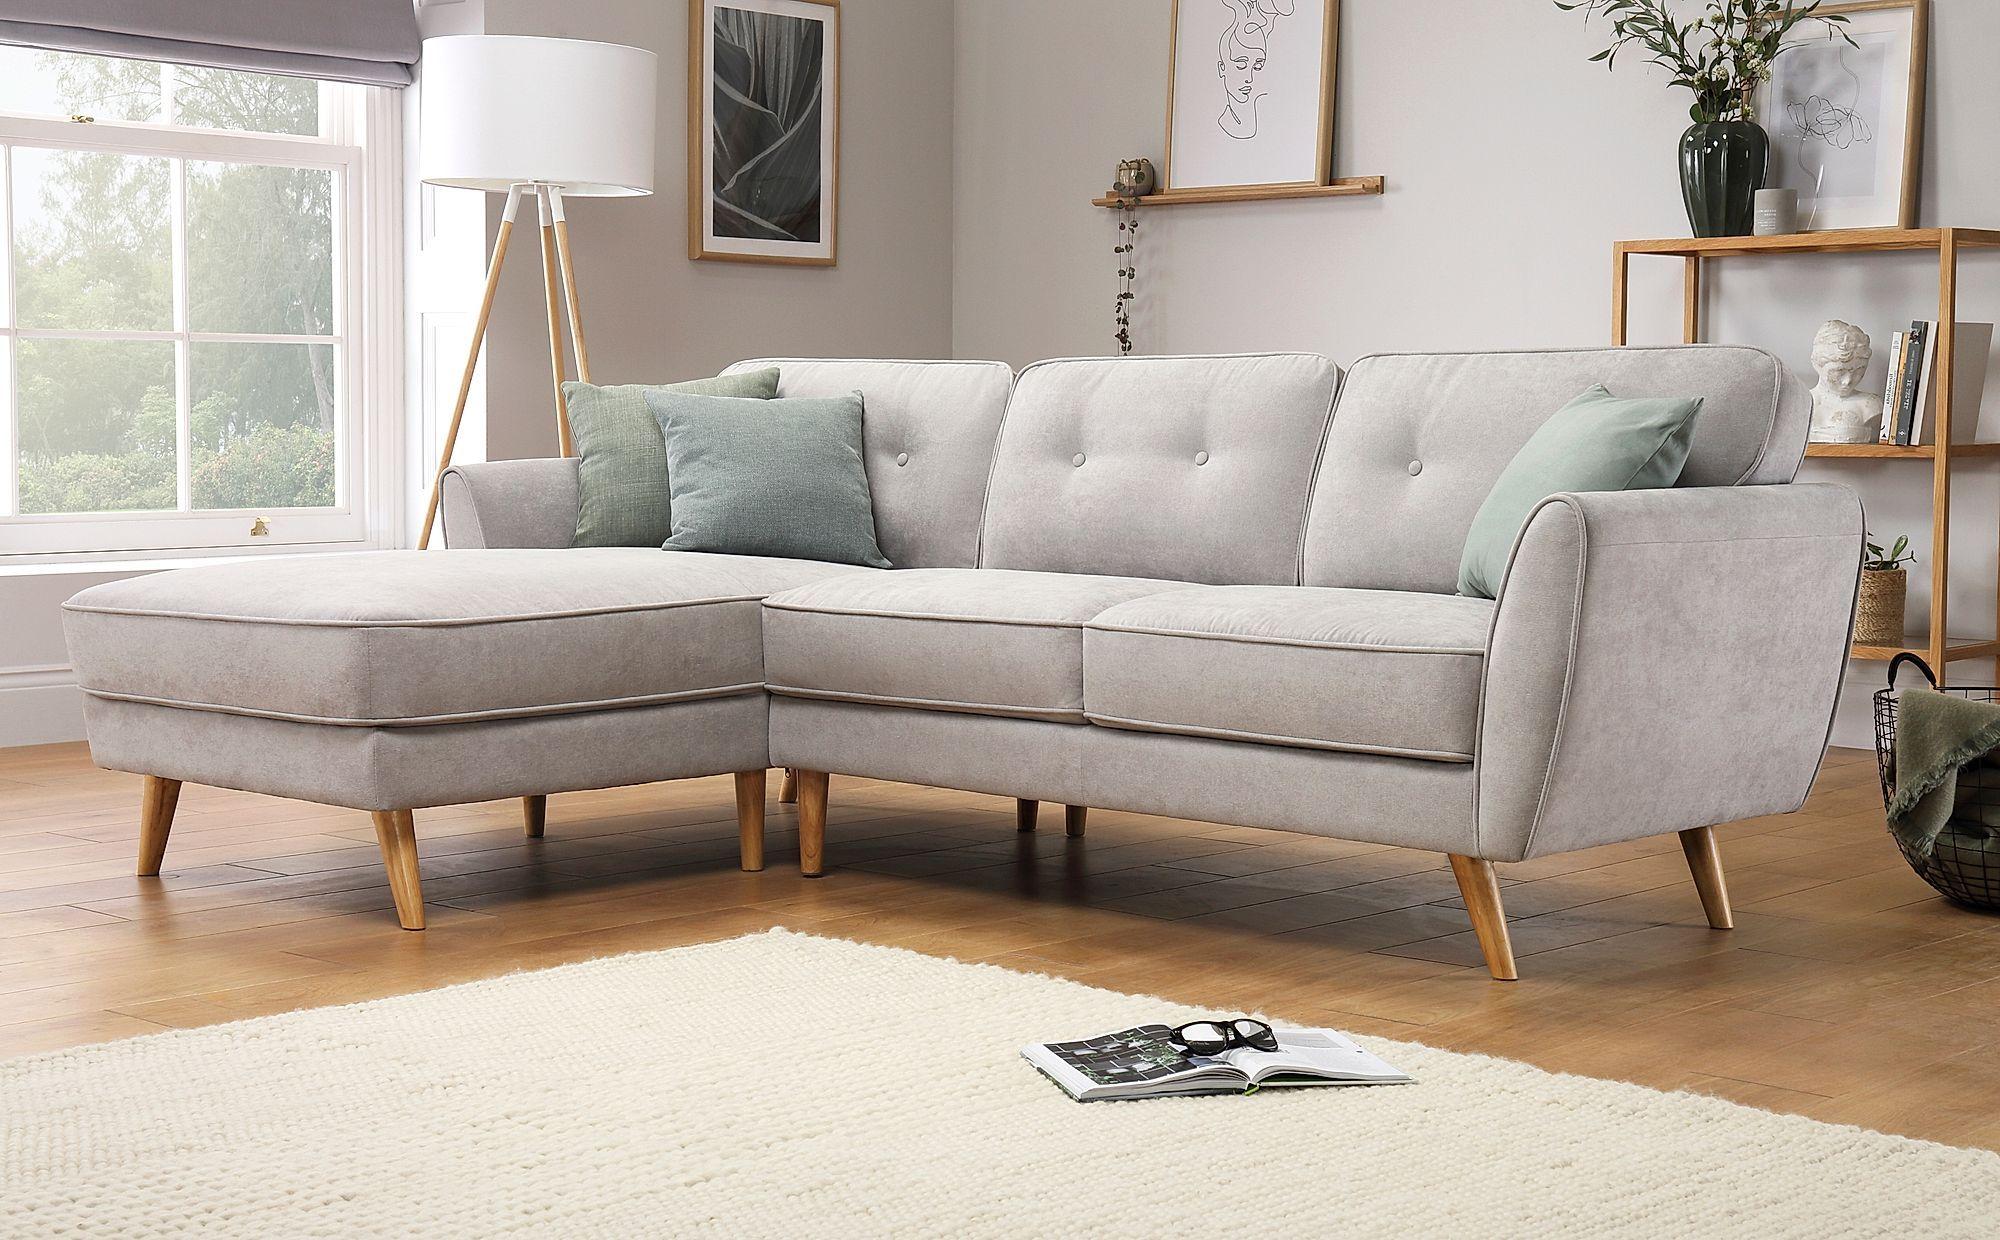 Harlow Dove Grey Plush Fabric L Shape Corner Sofa Lhf Furniture Choice In 2020 Corner Sofa Furniture Choice Small Couches Living Room